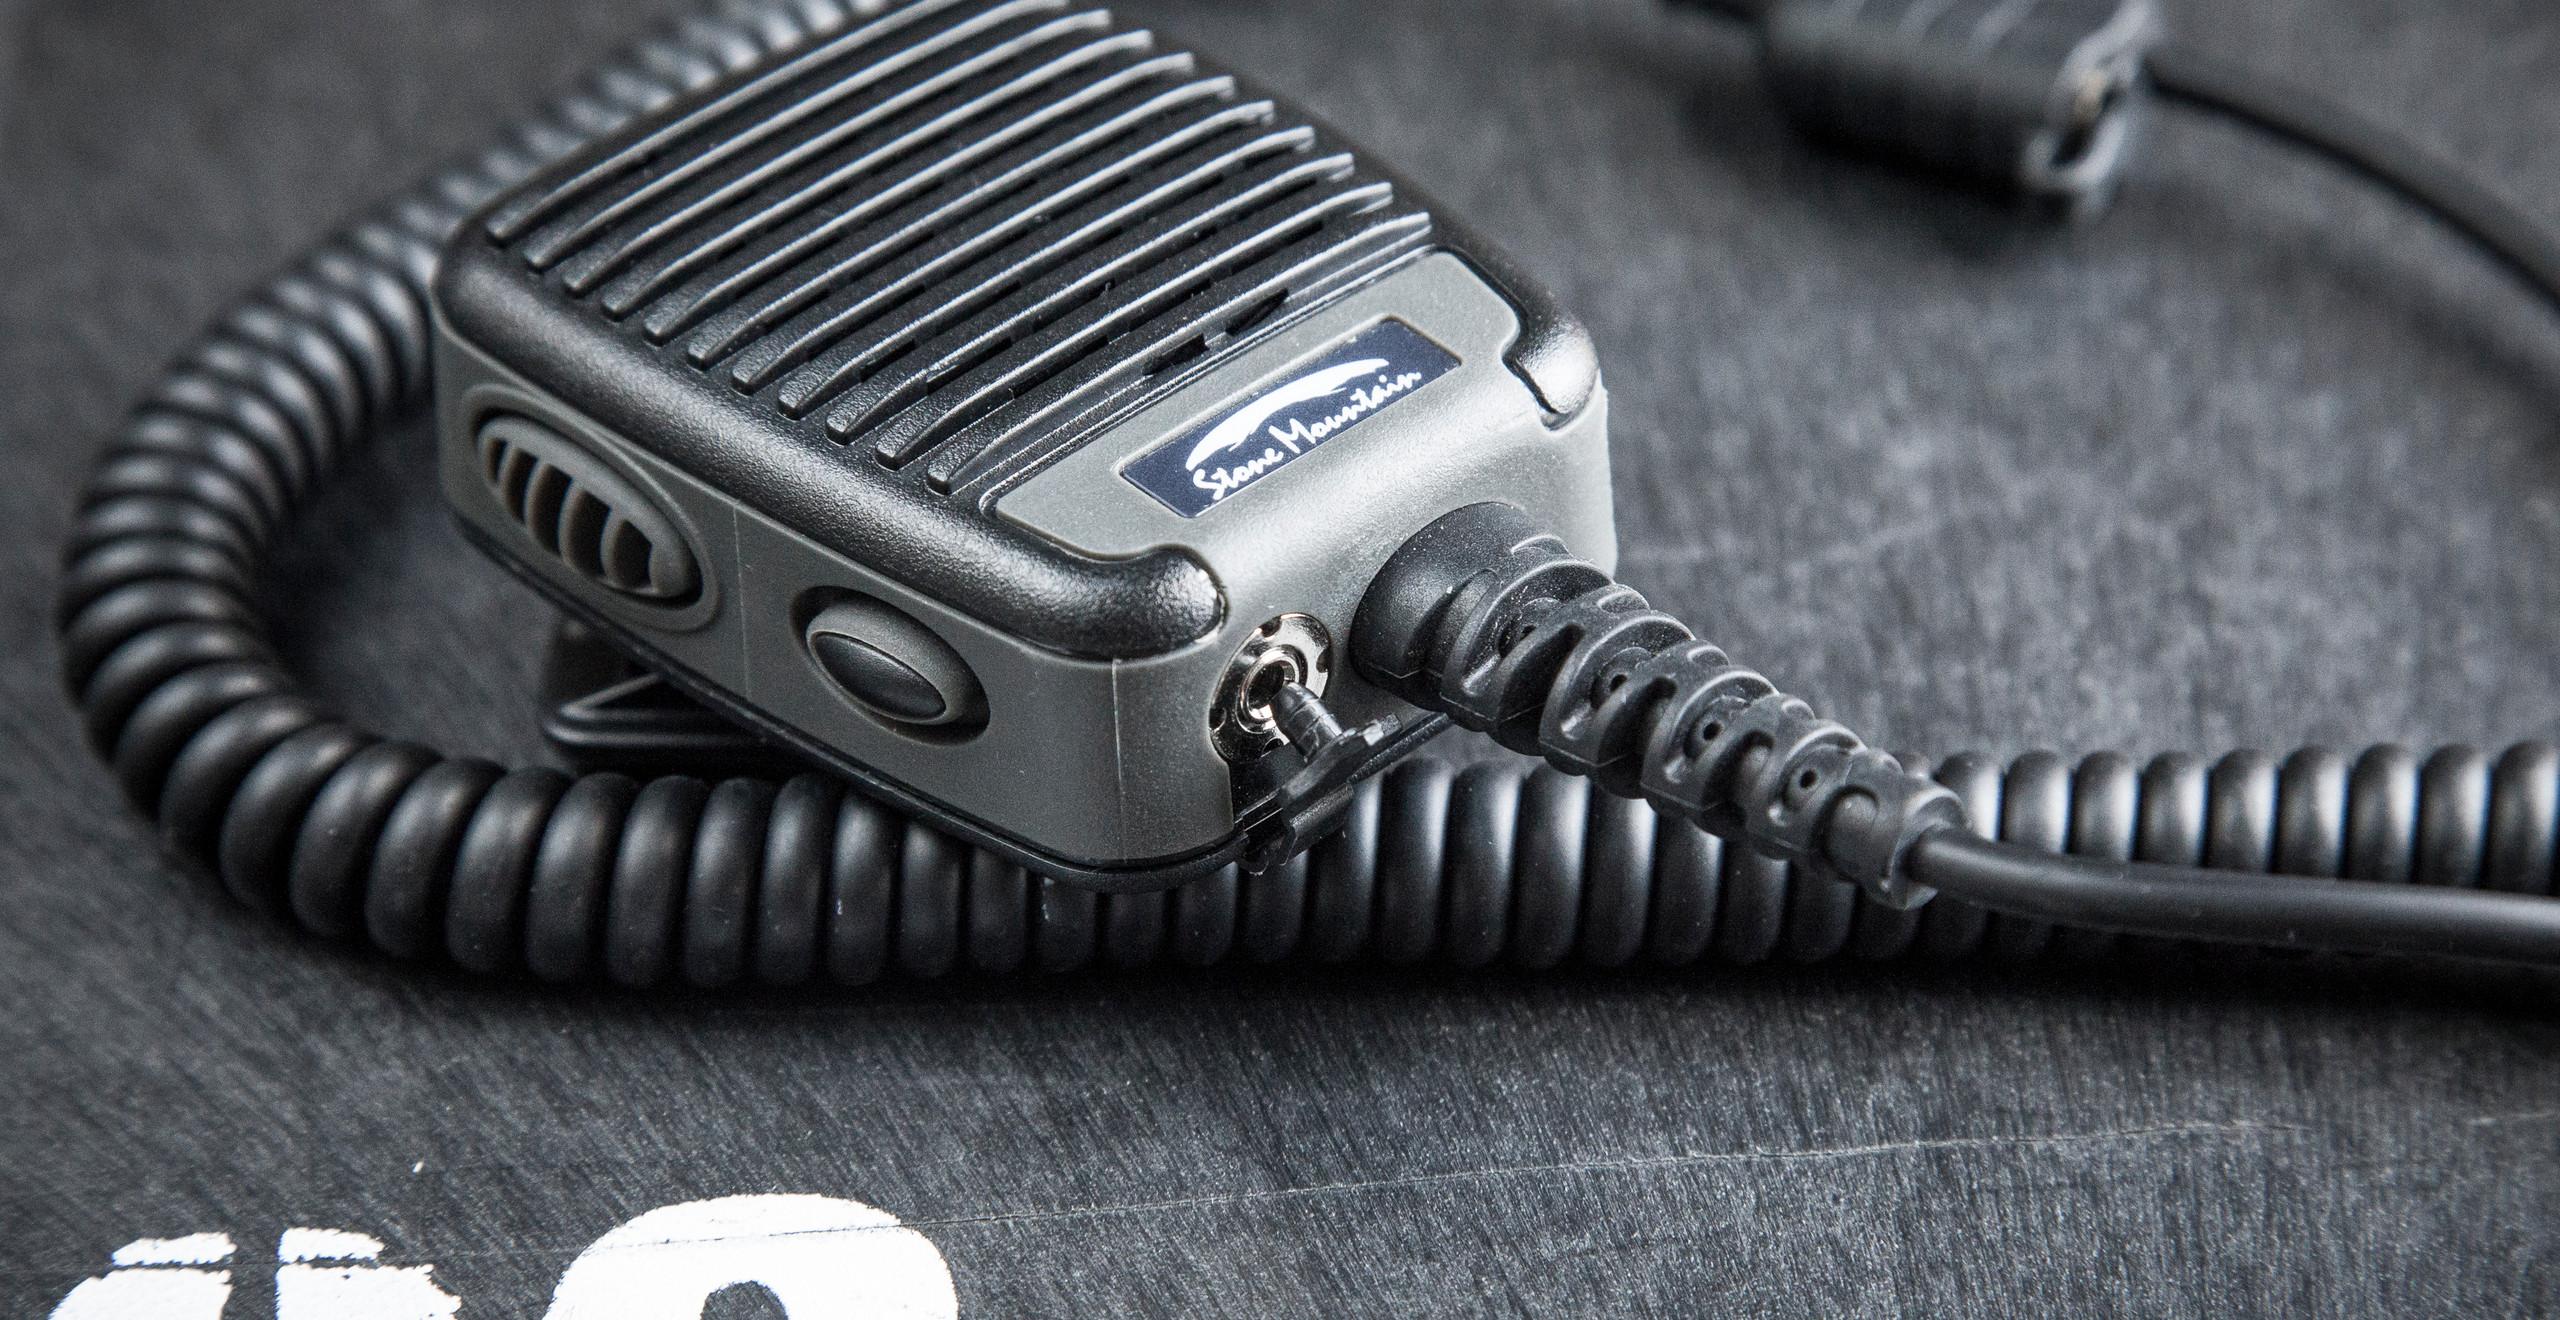 Stone Mountain Ltd Phoenix Elite PoC RSM speaker microphone Blackline simulations airsoft military simulations tactical zello accessories review bottom view